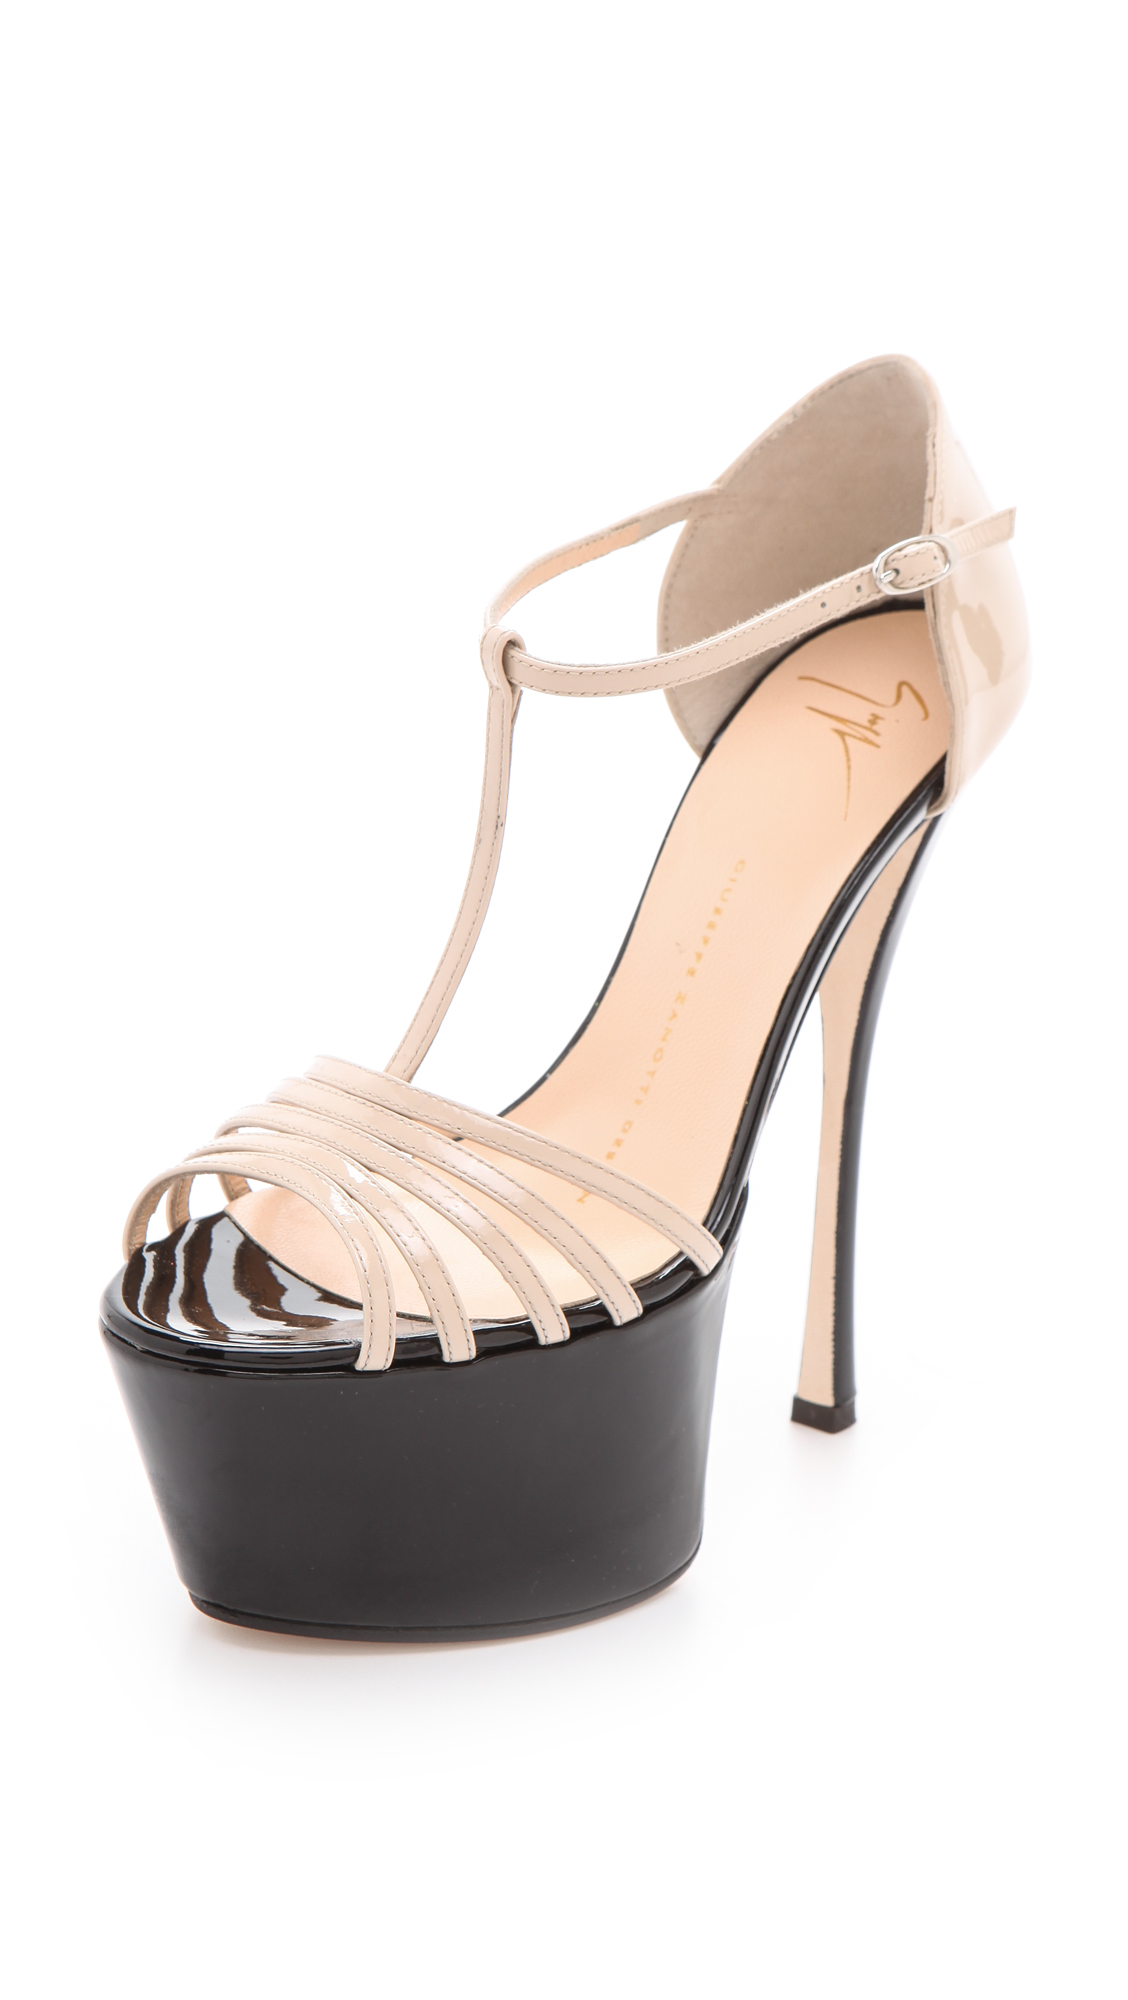 Giuseppe zanotti T Strap Platform Heels in Black   Lyst